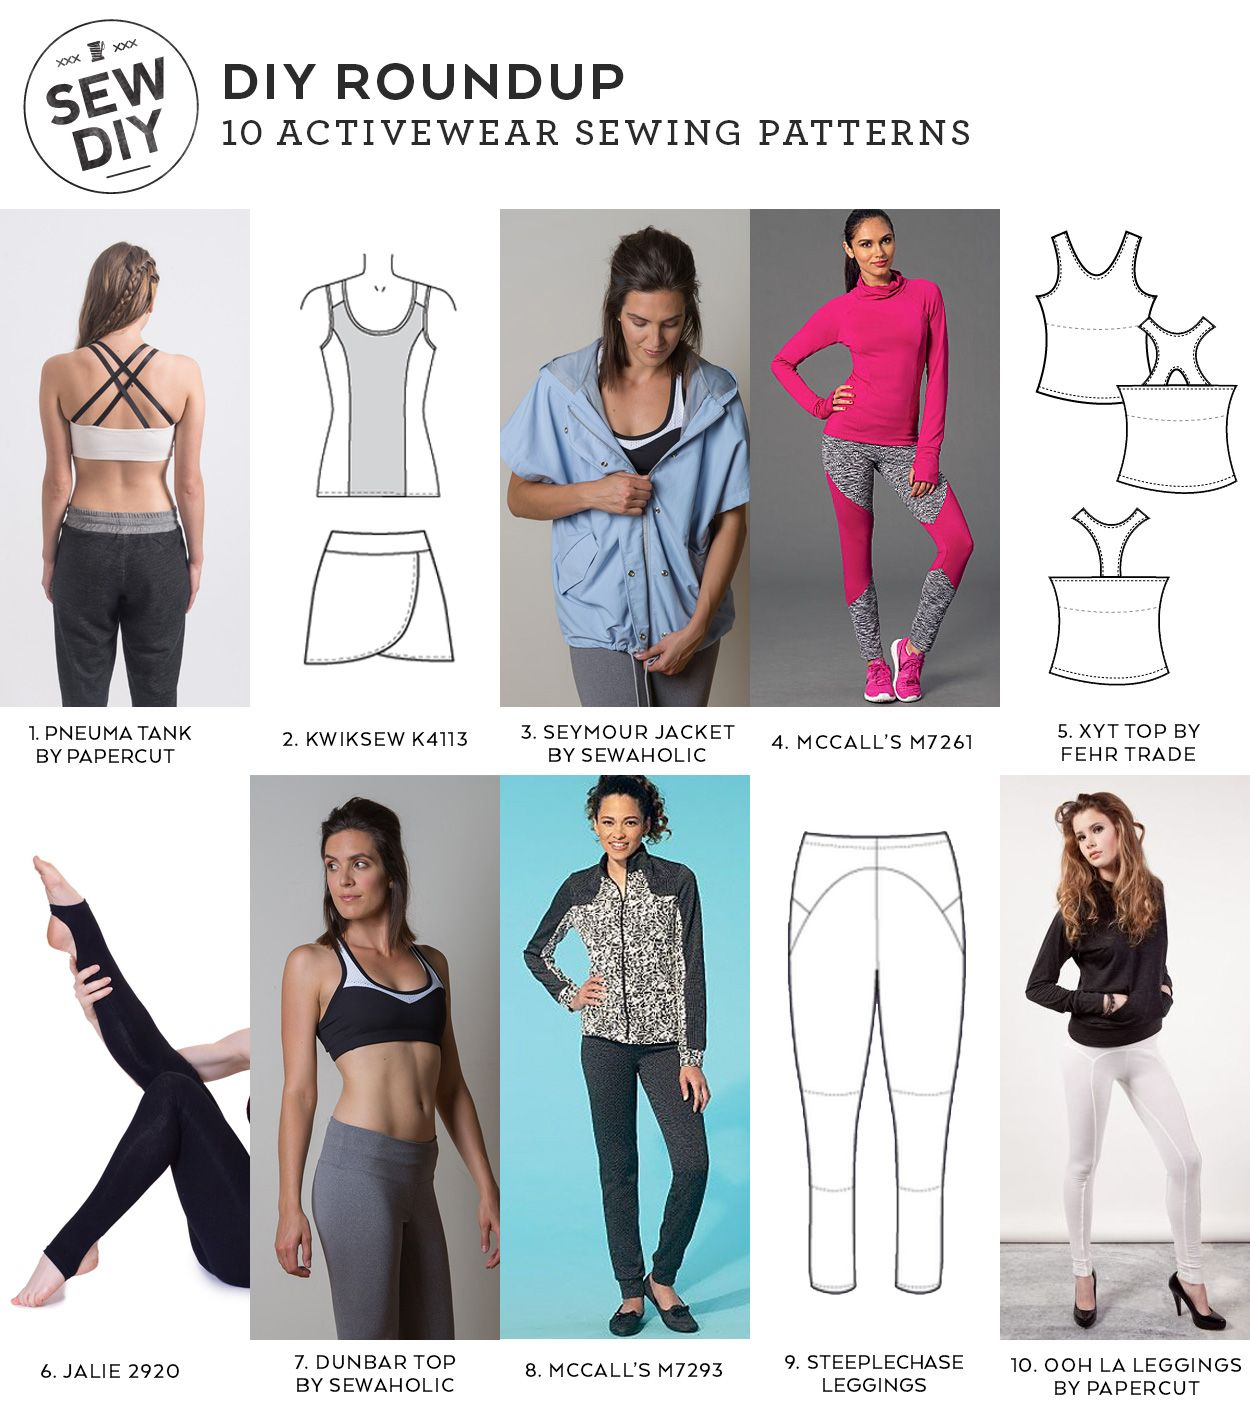 10 activewear sewing patterns diy roundup sewing diy clothing 10 activewear sewing patterns jeuxipadfo Images